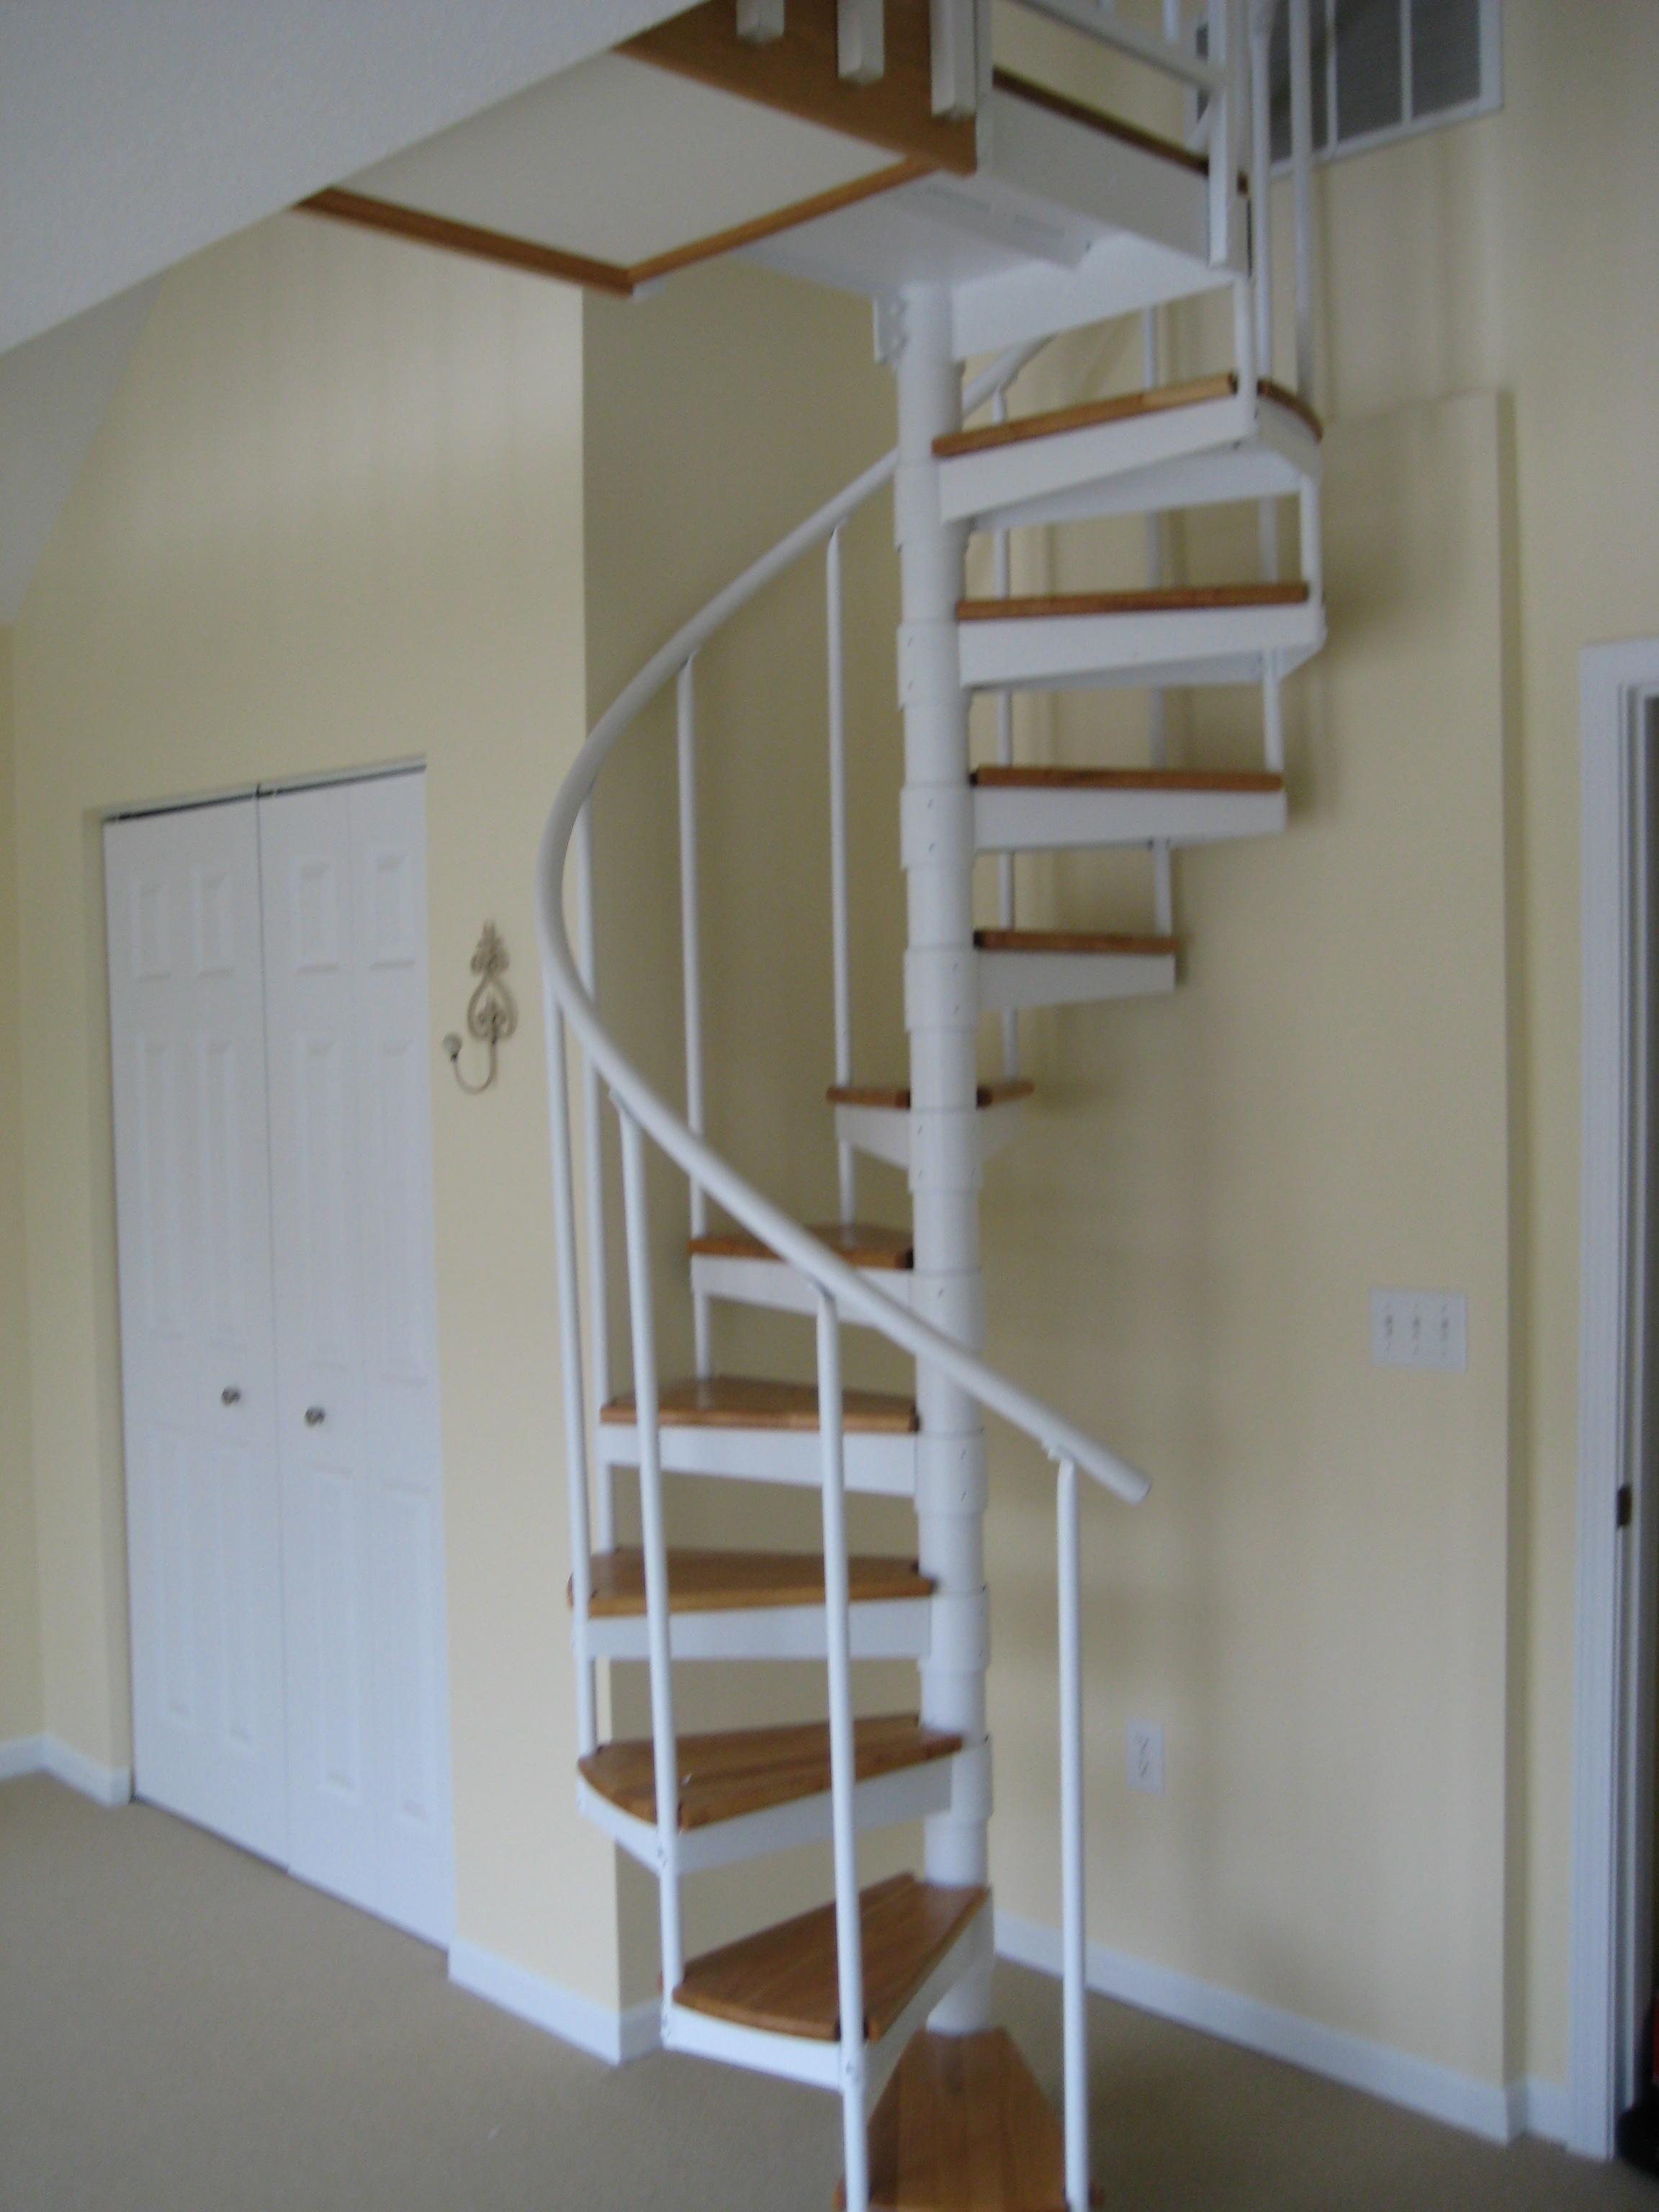 Attic Stairway Design Ideas Remodel Attic Stairs Loft